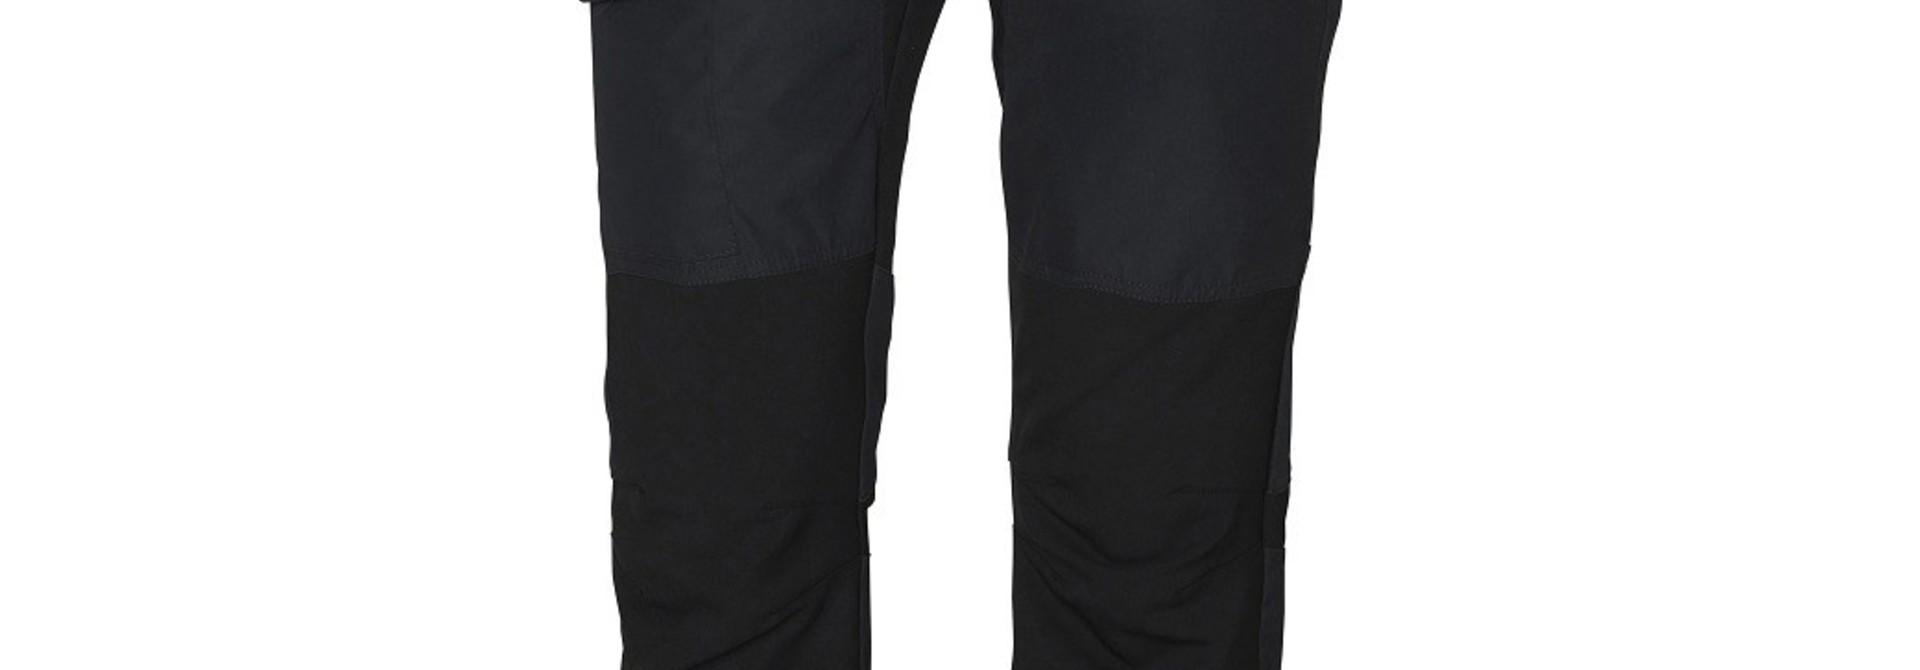 Chevalier Alabama Vent Pro Pant Women Navy Black